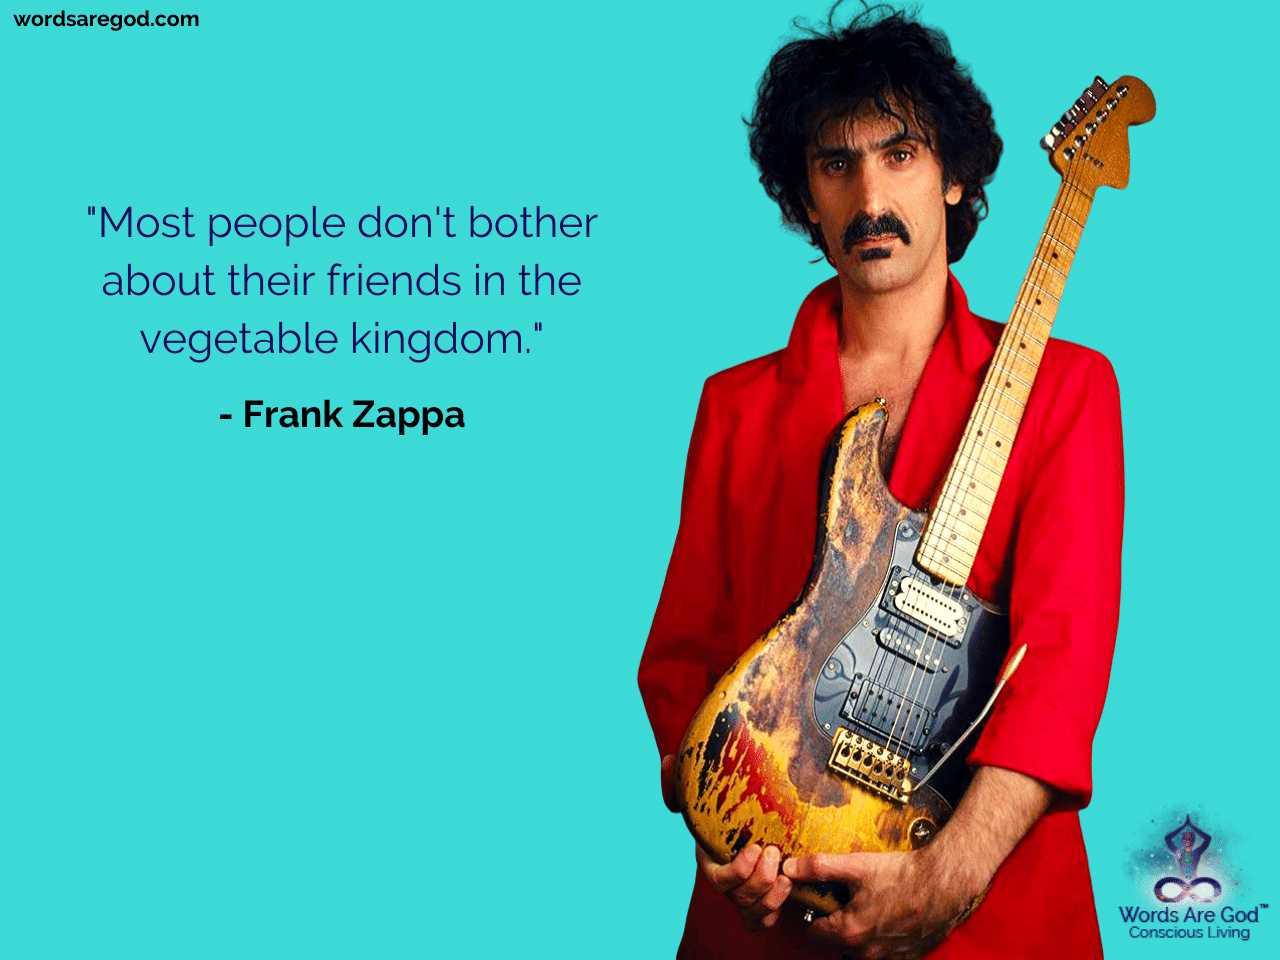 Frank Zappa Motivational Quote by Frank Zappa